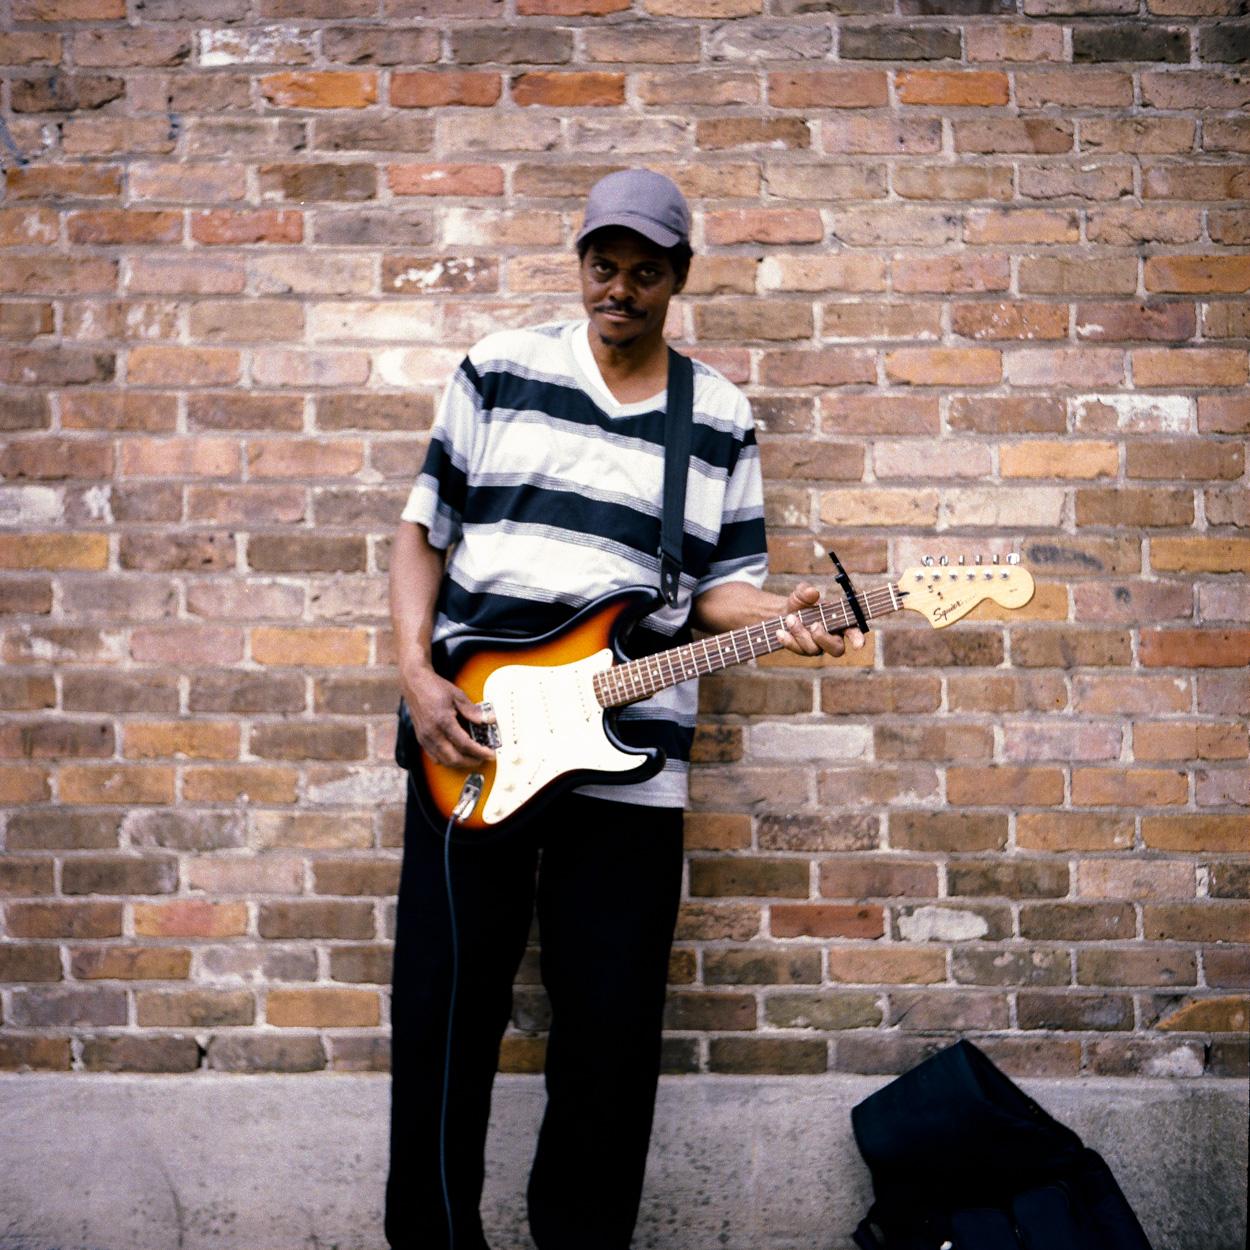 A local musician doin his thang on the Esplanade